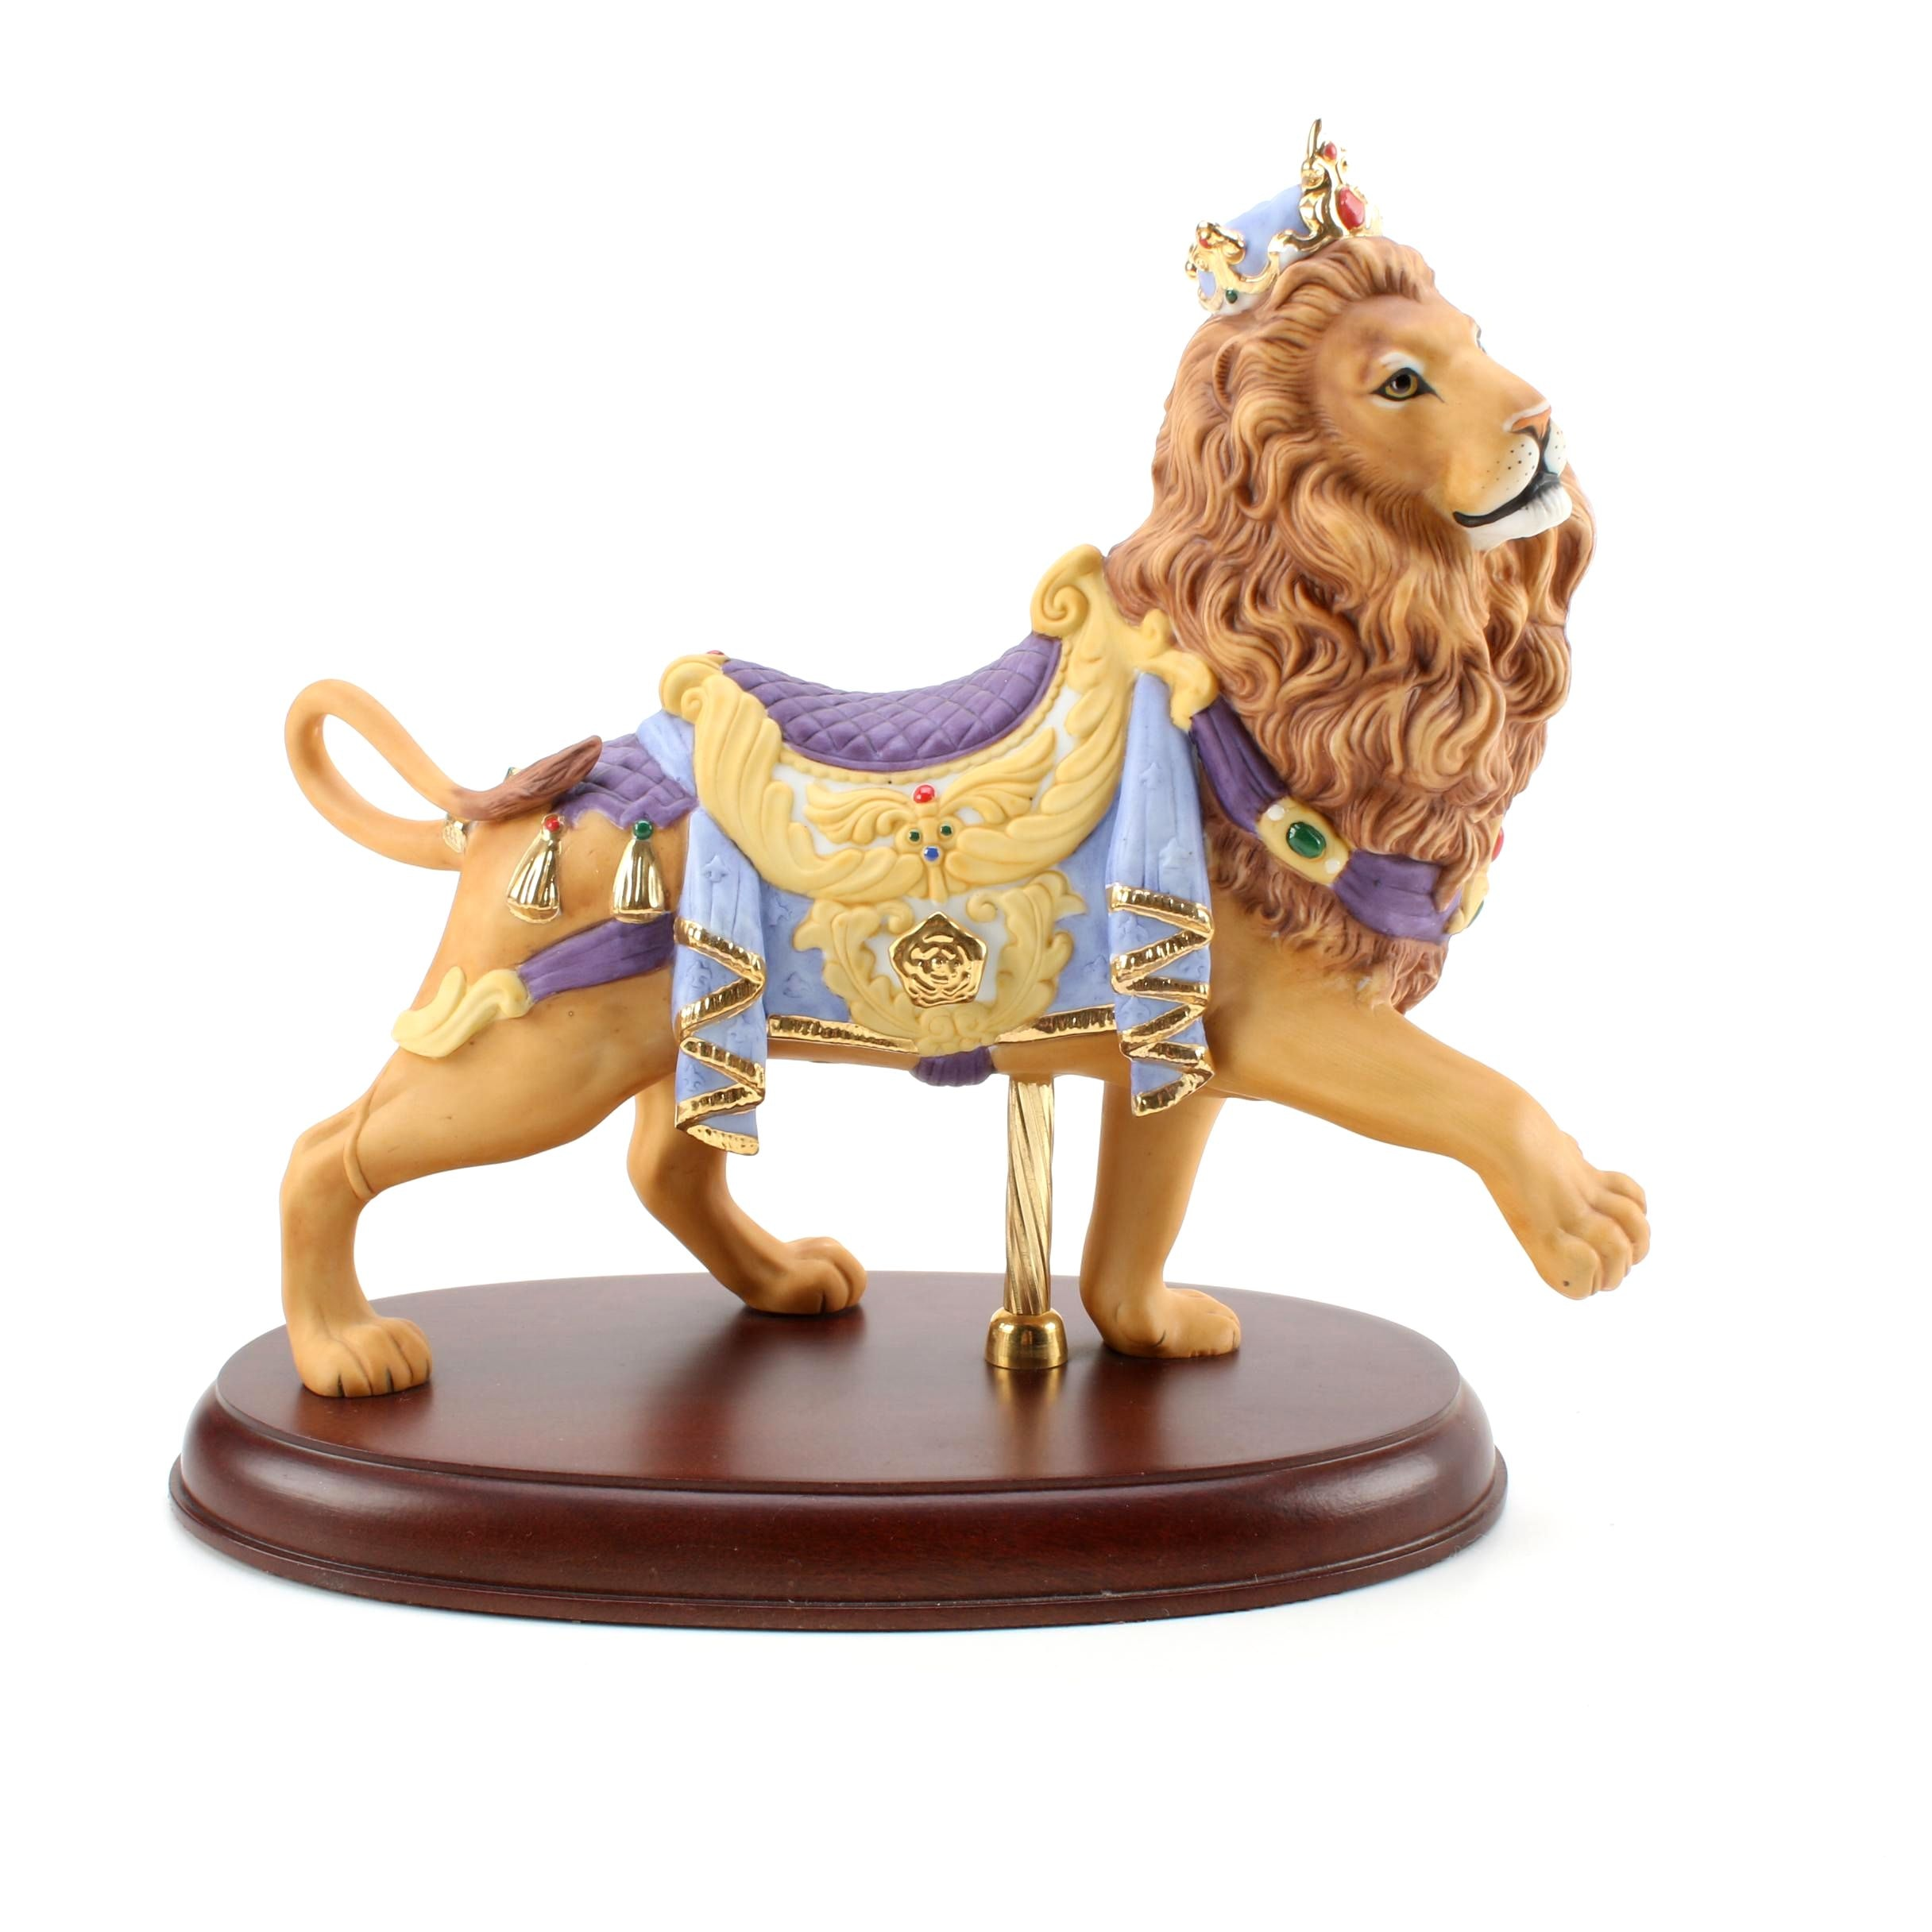 Lenox Carousel Lion Figurine